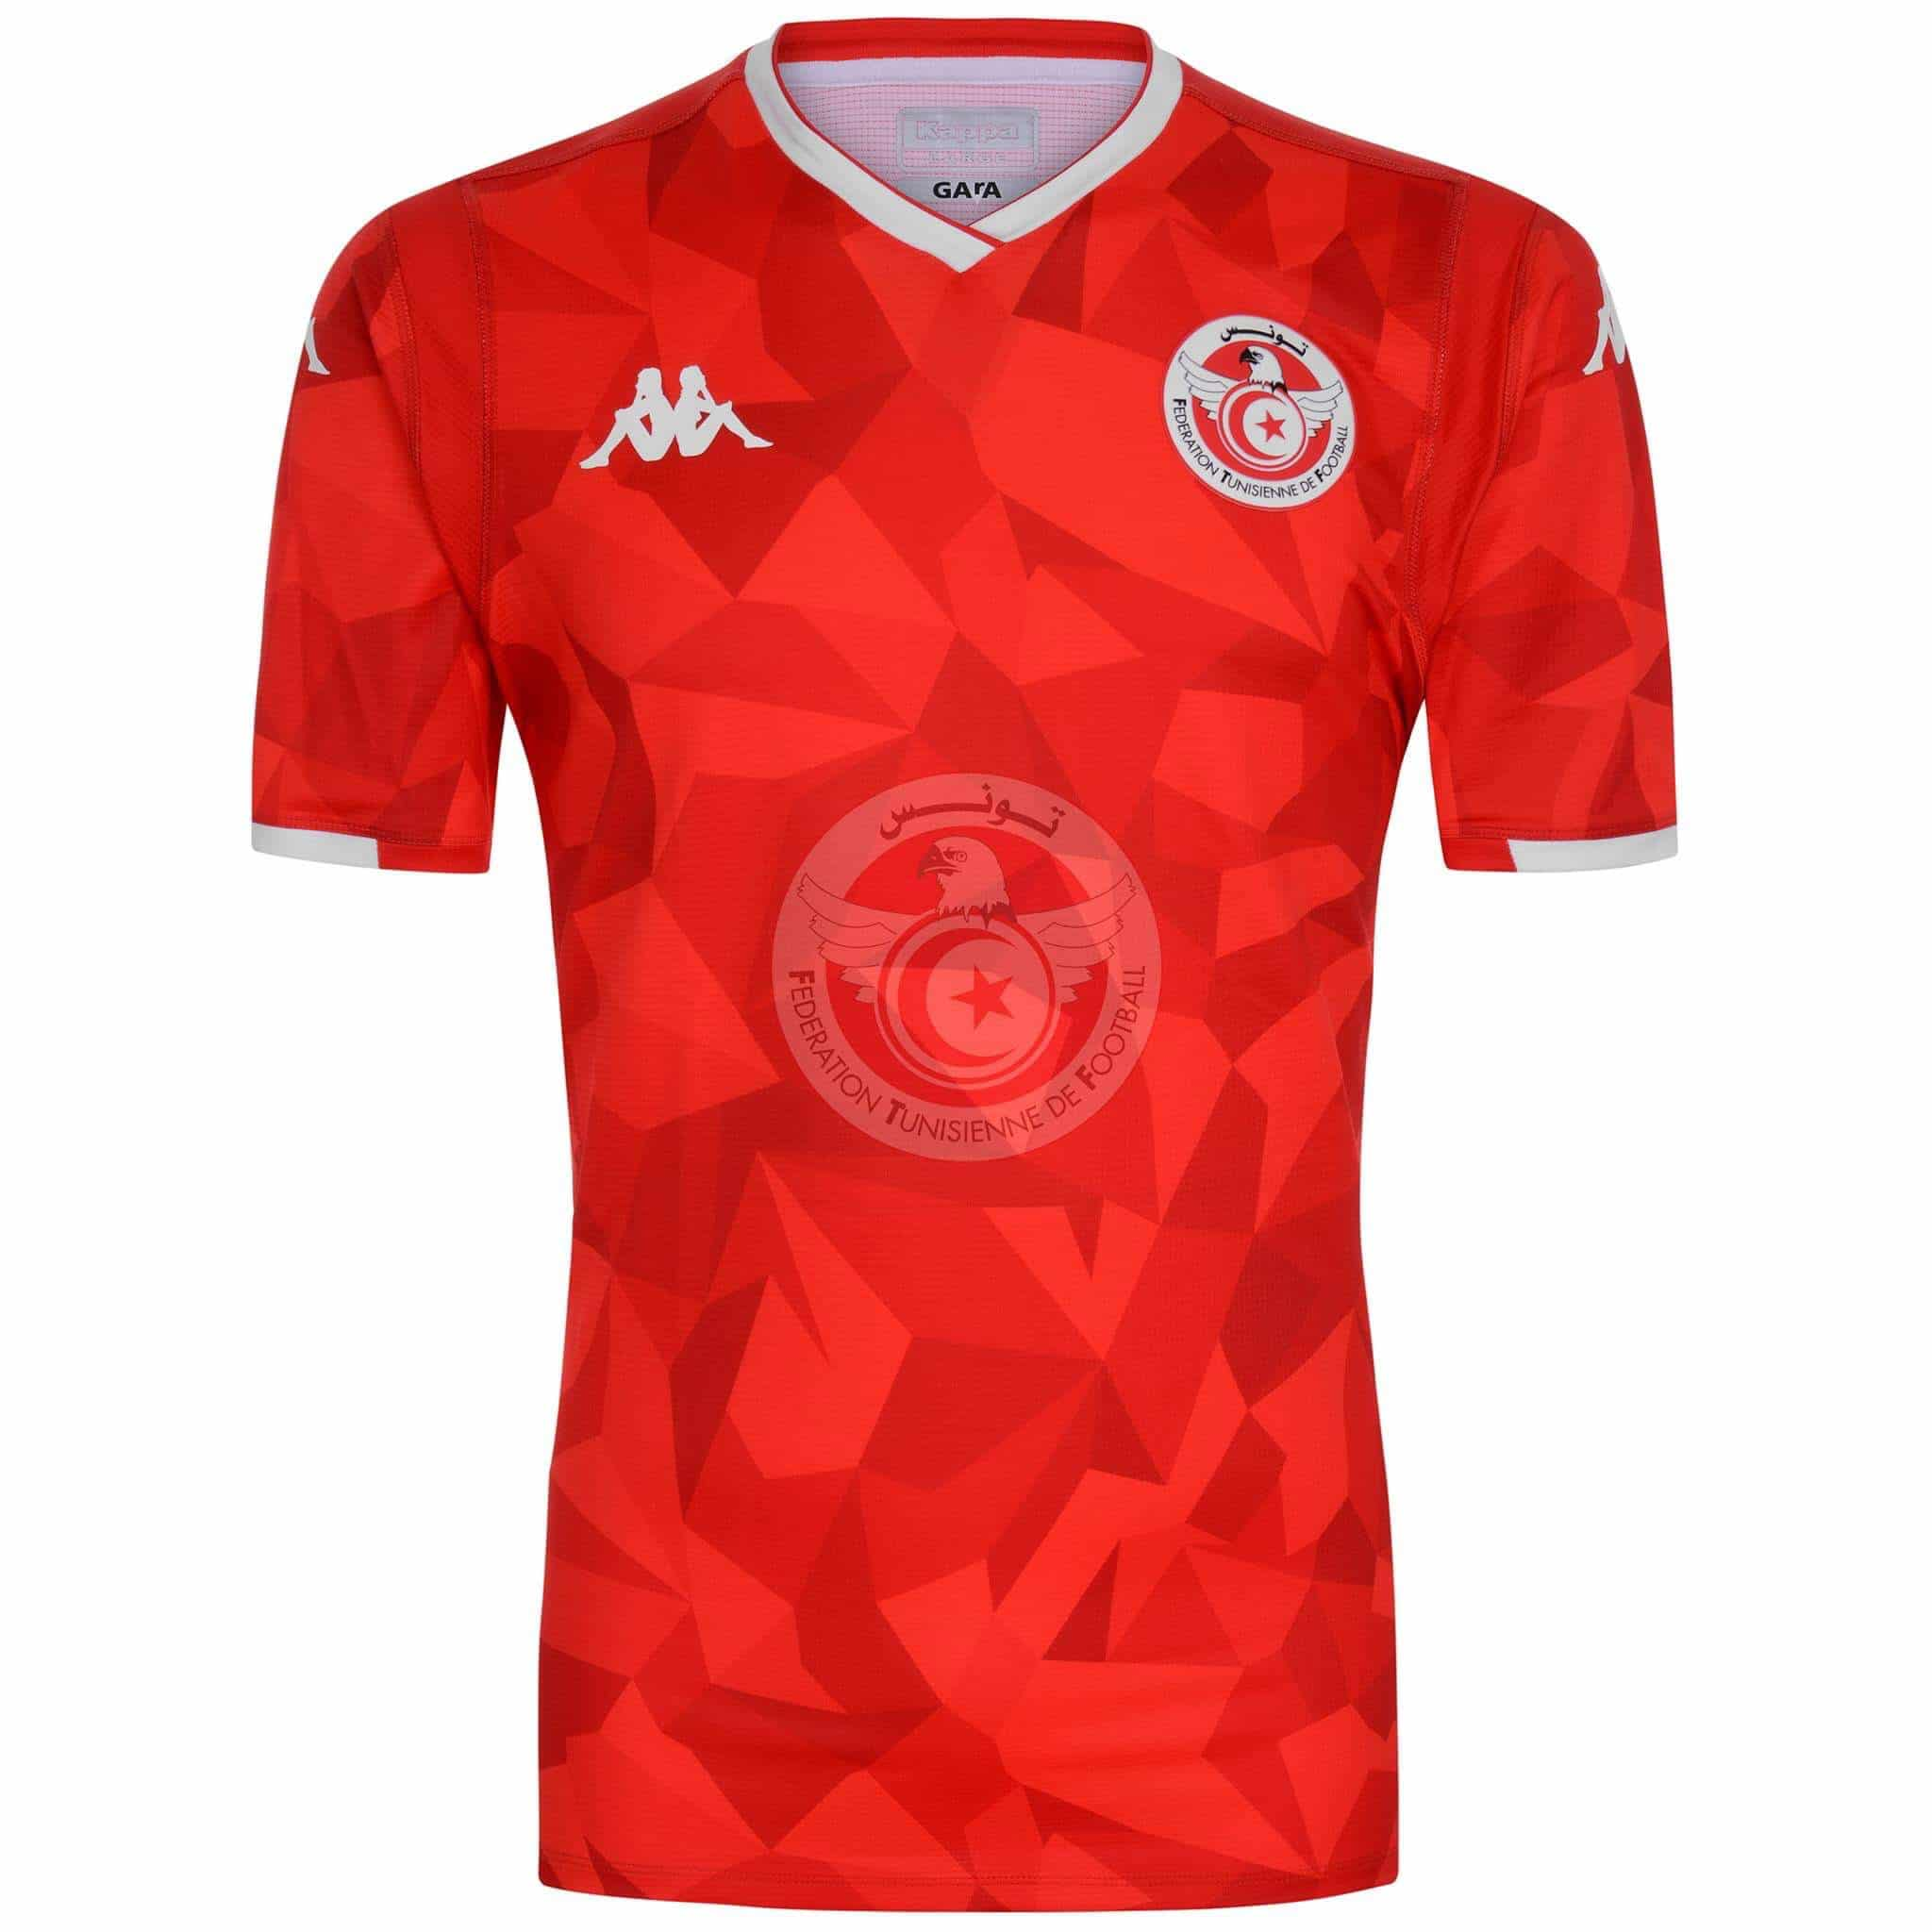 Tunisia 2019 Kappa Home Kit Revealed